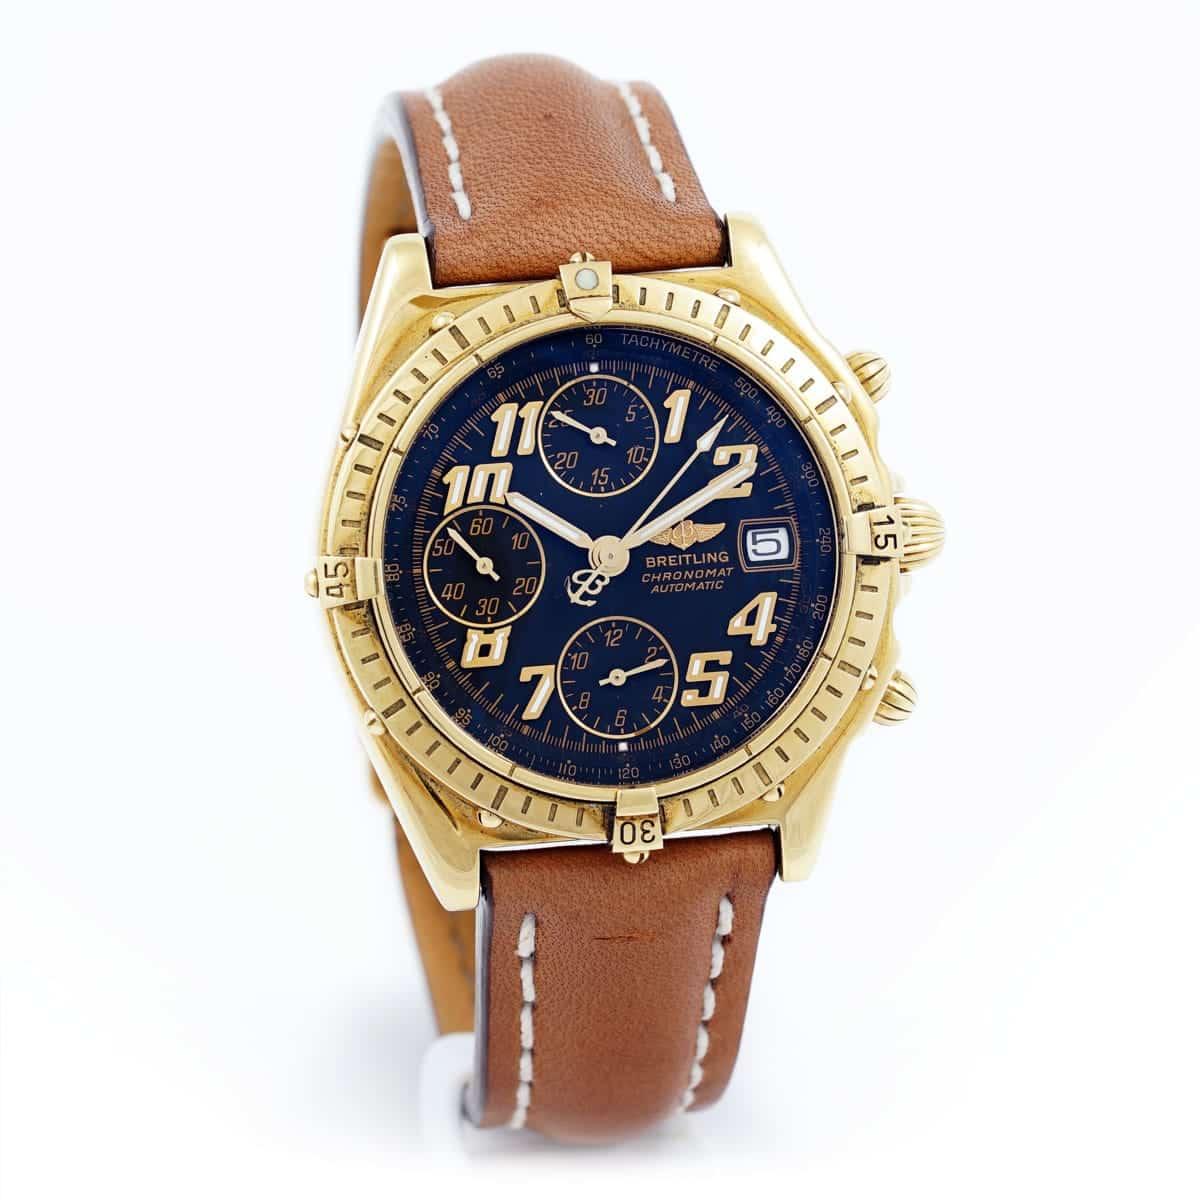 105091-Breitling-Chronomat-or-jaune-montres-occasion-seconde-main-lionel-meylan-vevey